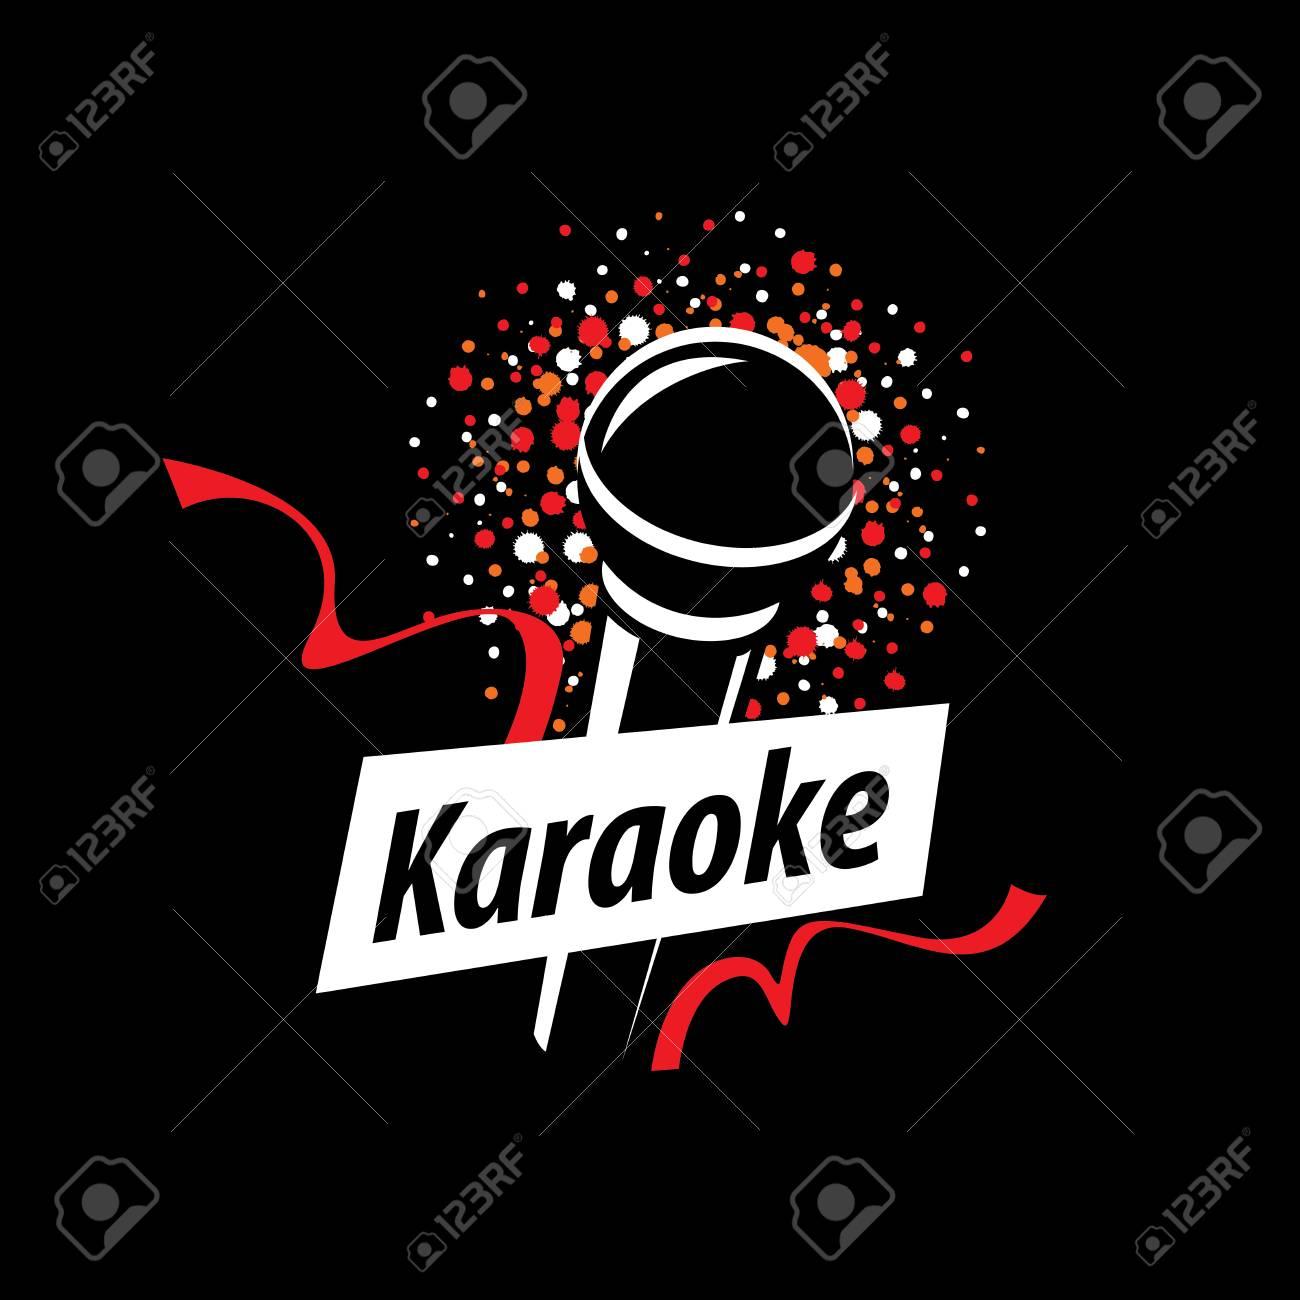 template design logo karaoke vector illustration of icon royalty